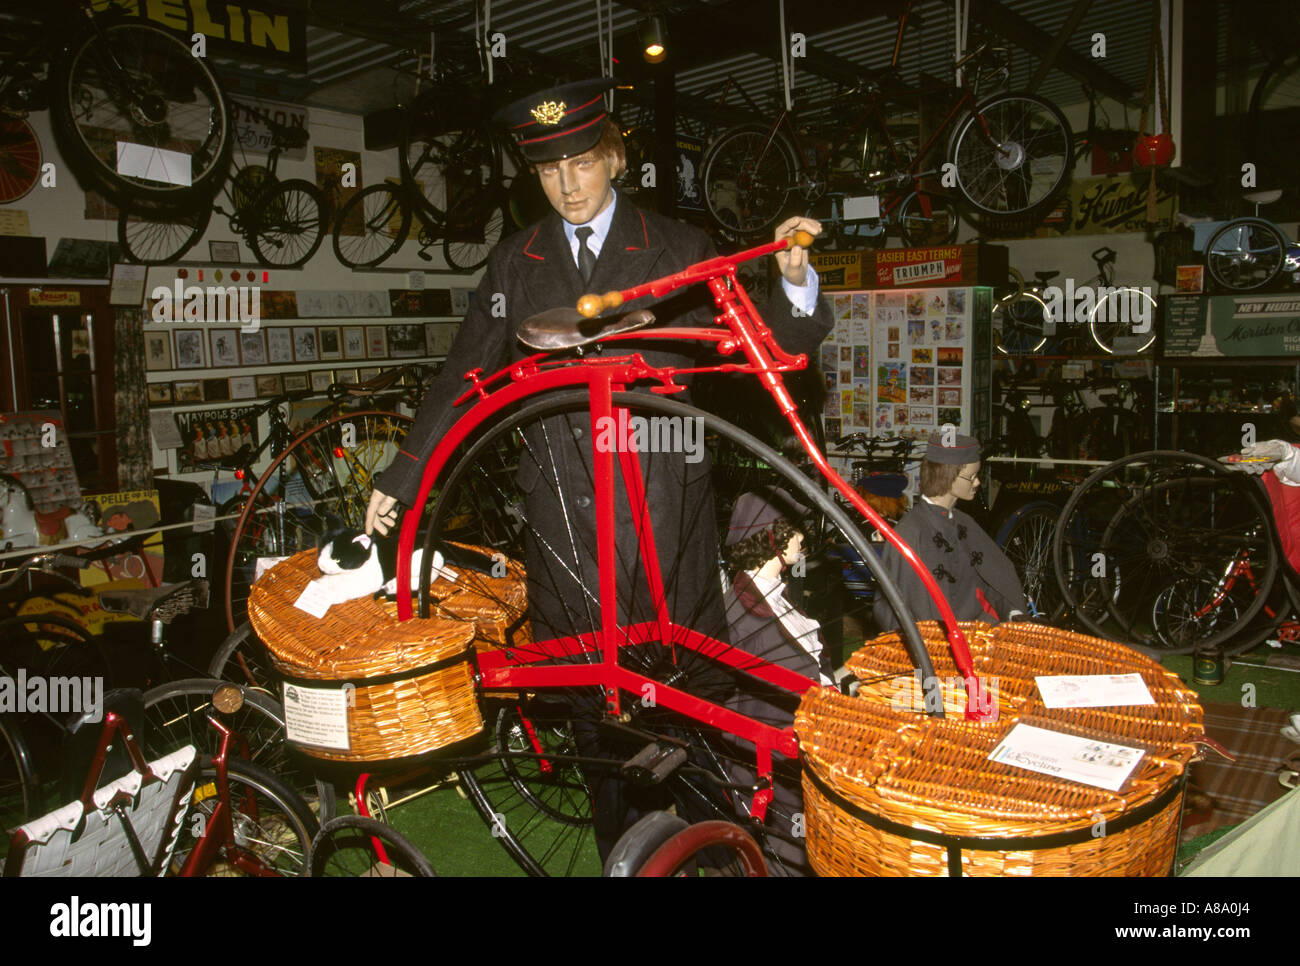 UK England Cornwall Delabole National Cycling Museum Postal Bike - Stock Image